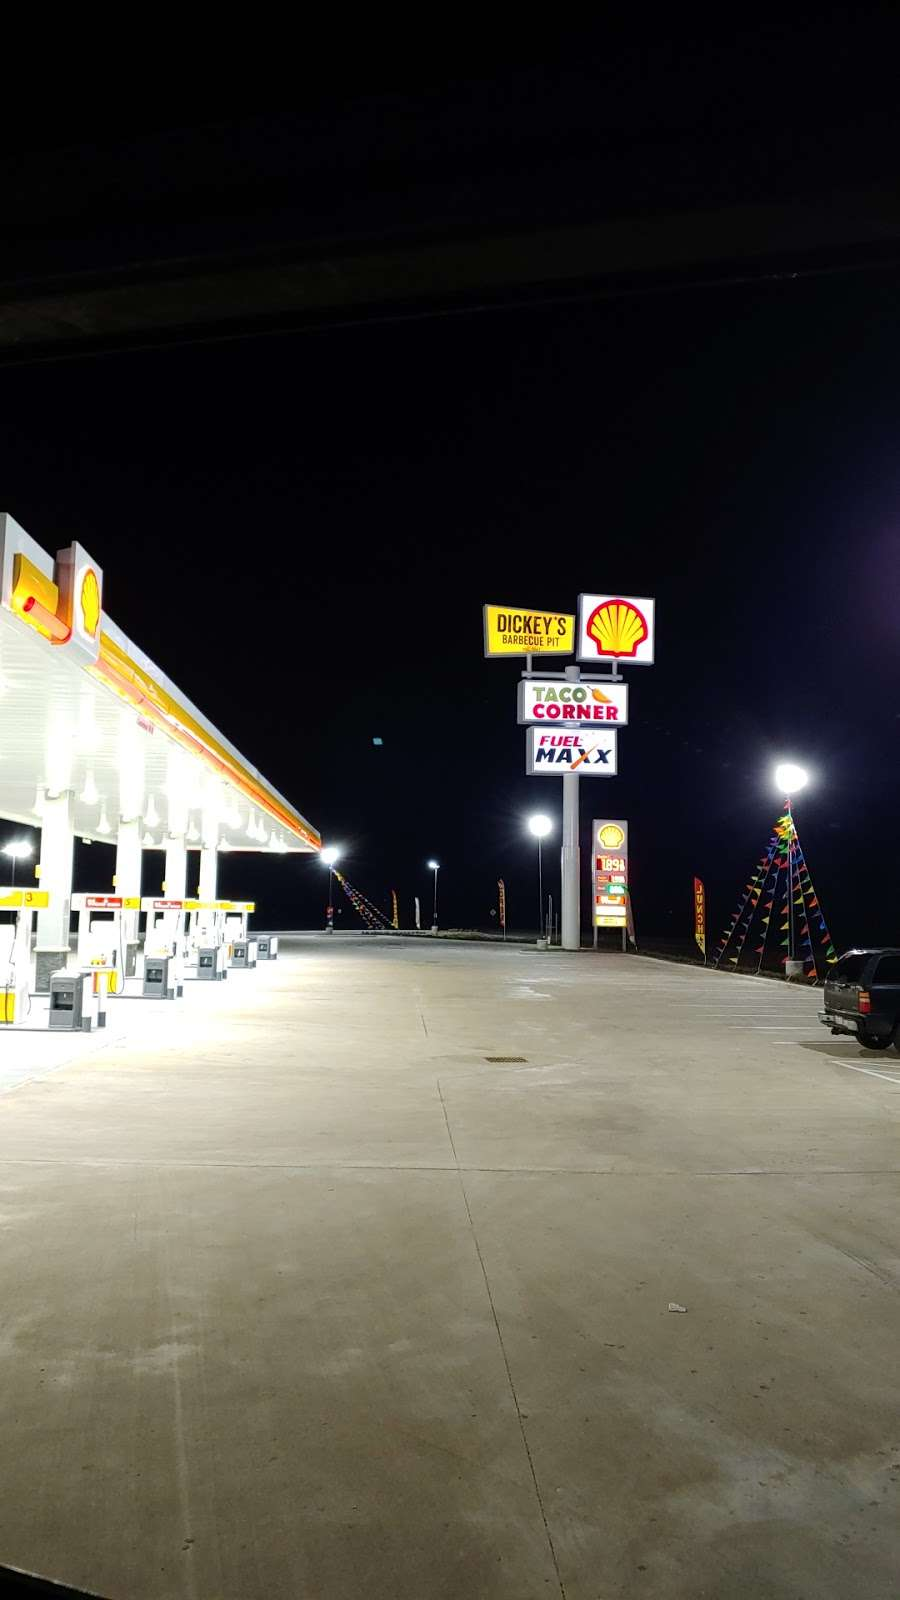 FUEL MAXX 46 - gas station    Photo 4 of 5   Address: 13835 TX-105, Cleveland, TX 77327, USA   Phone: (281) 806-7721